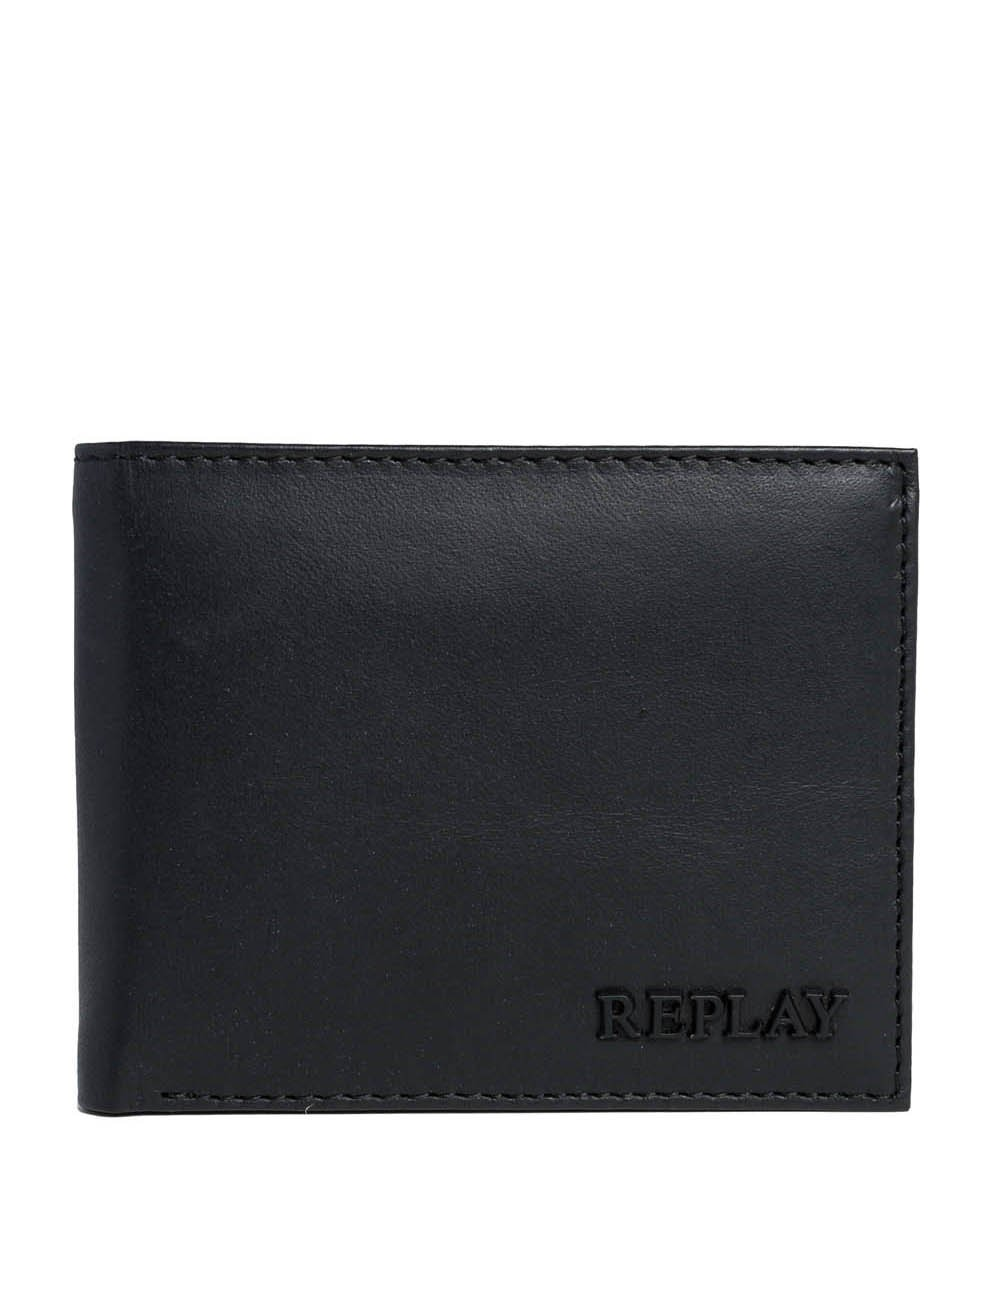 Replay Men's Men's Leather Black Wallet Black